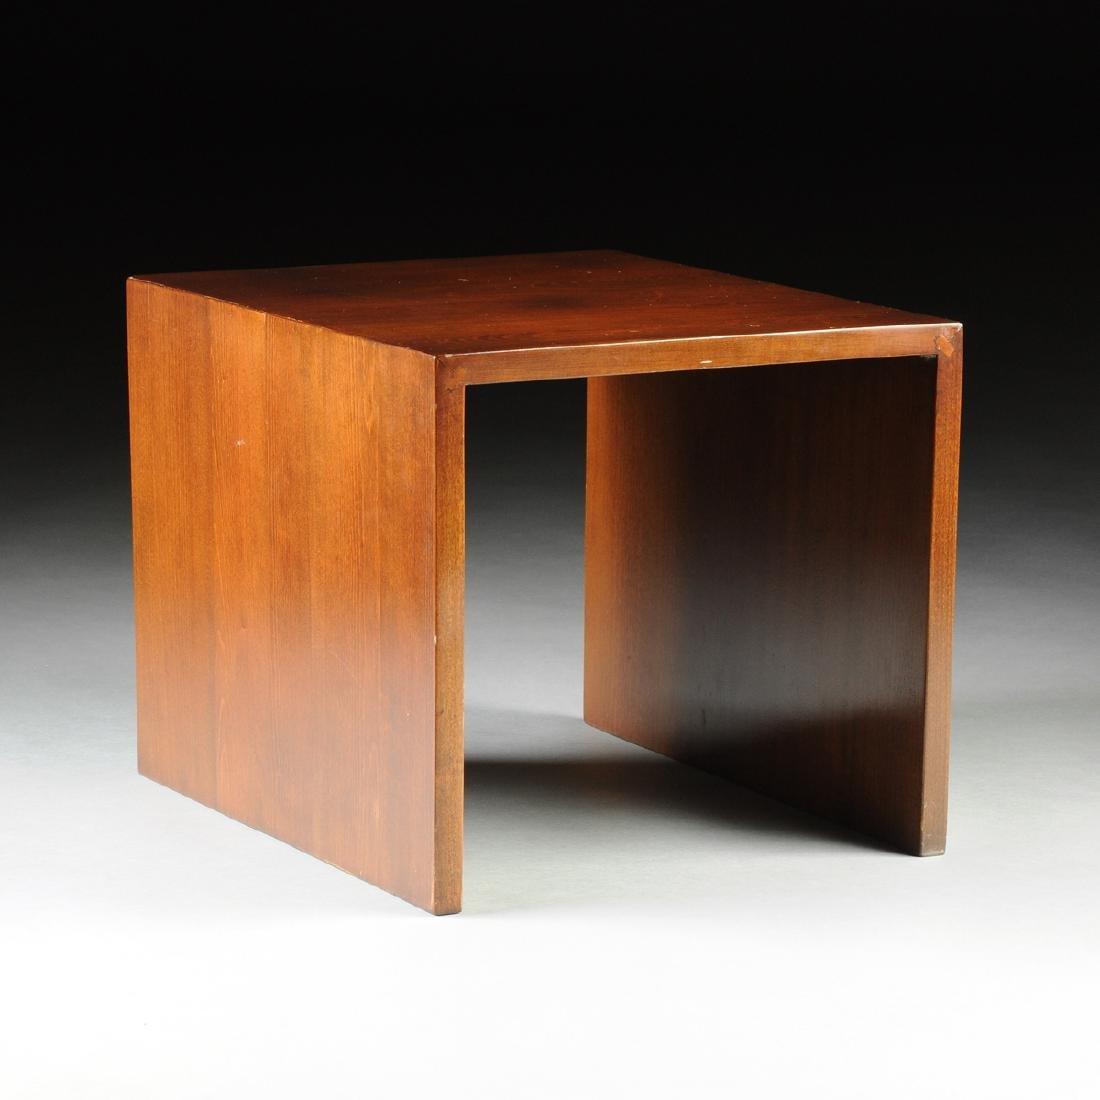 A MID CENTURY MODERN AMERICAN WALNUT SIDE TABLE, THIRD